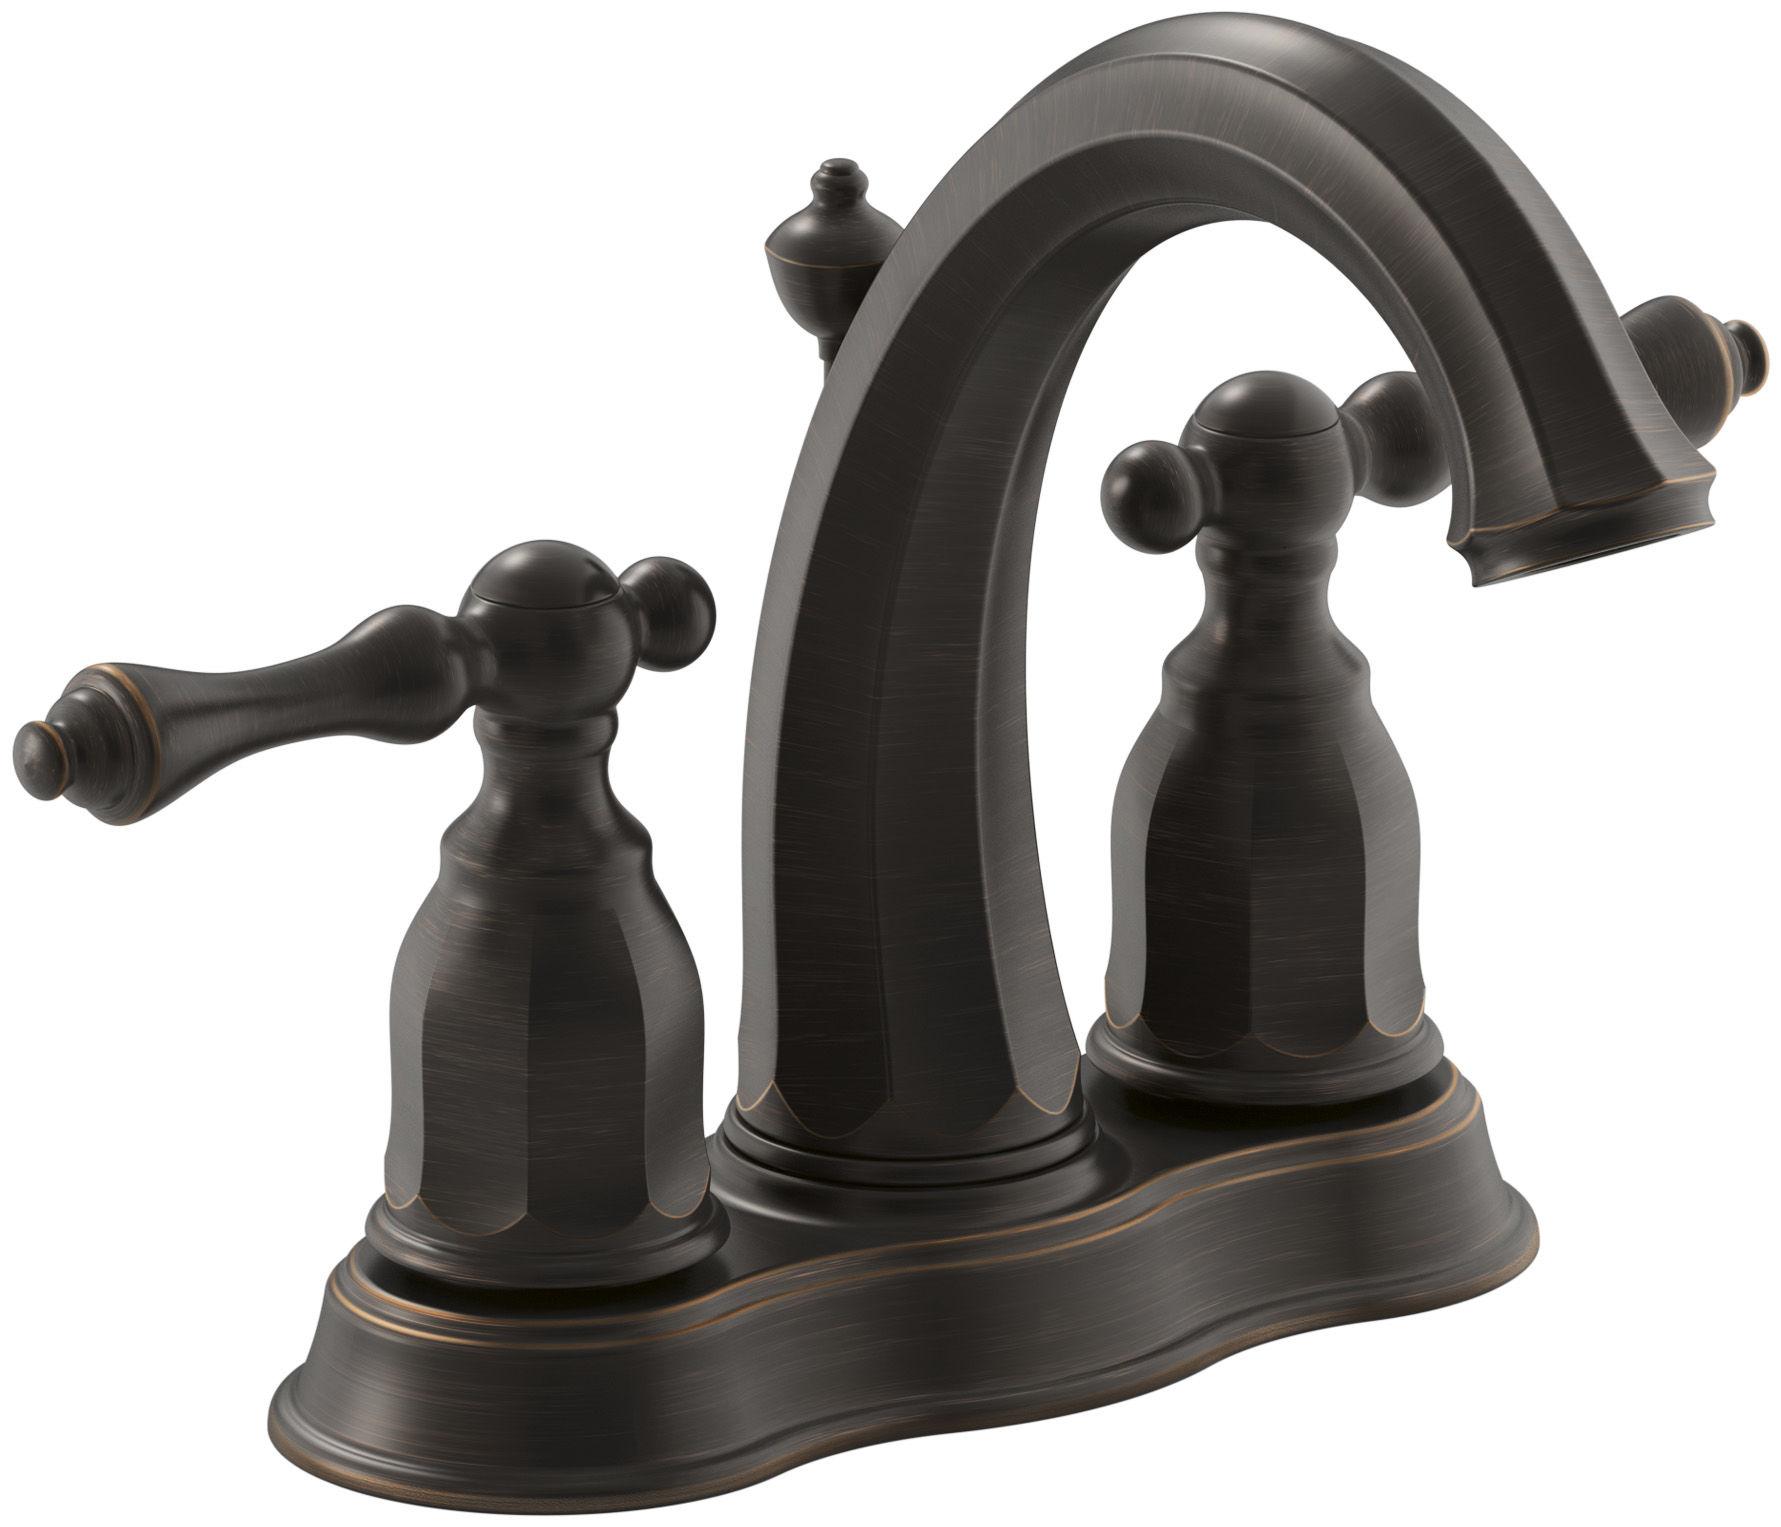 Kohler Lavatory Faucet - K-13490-4